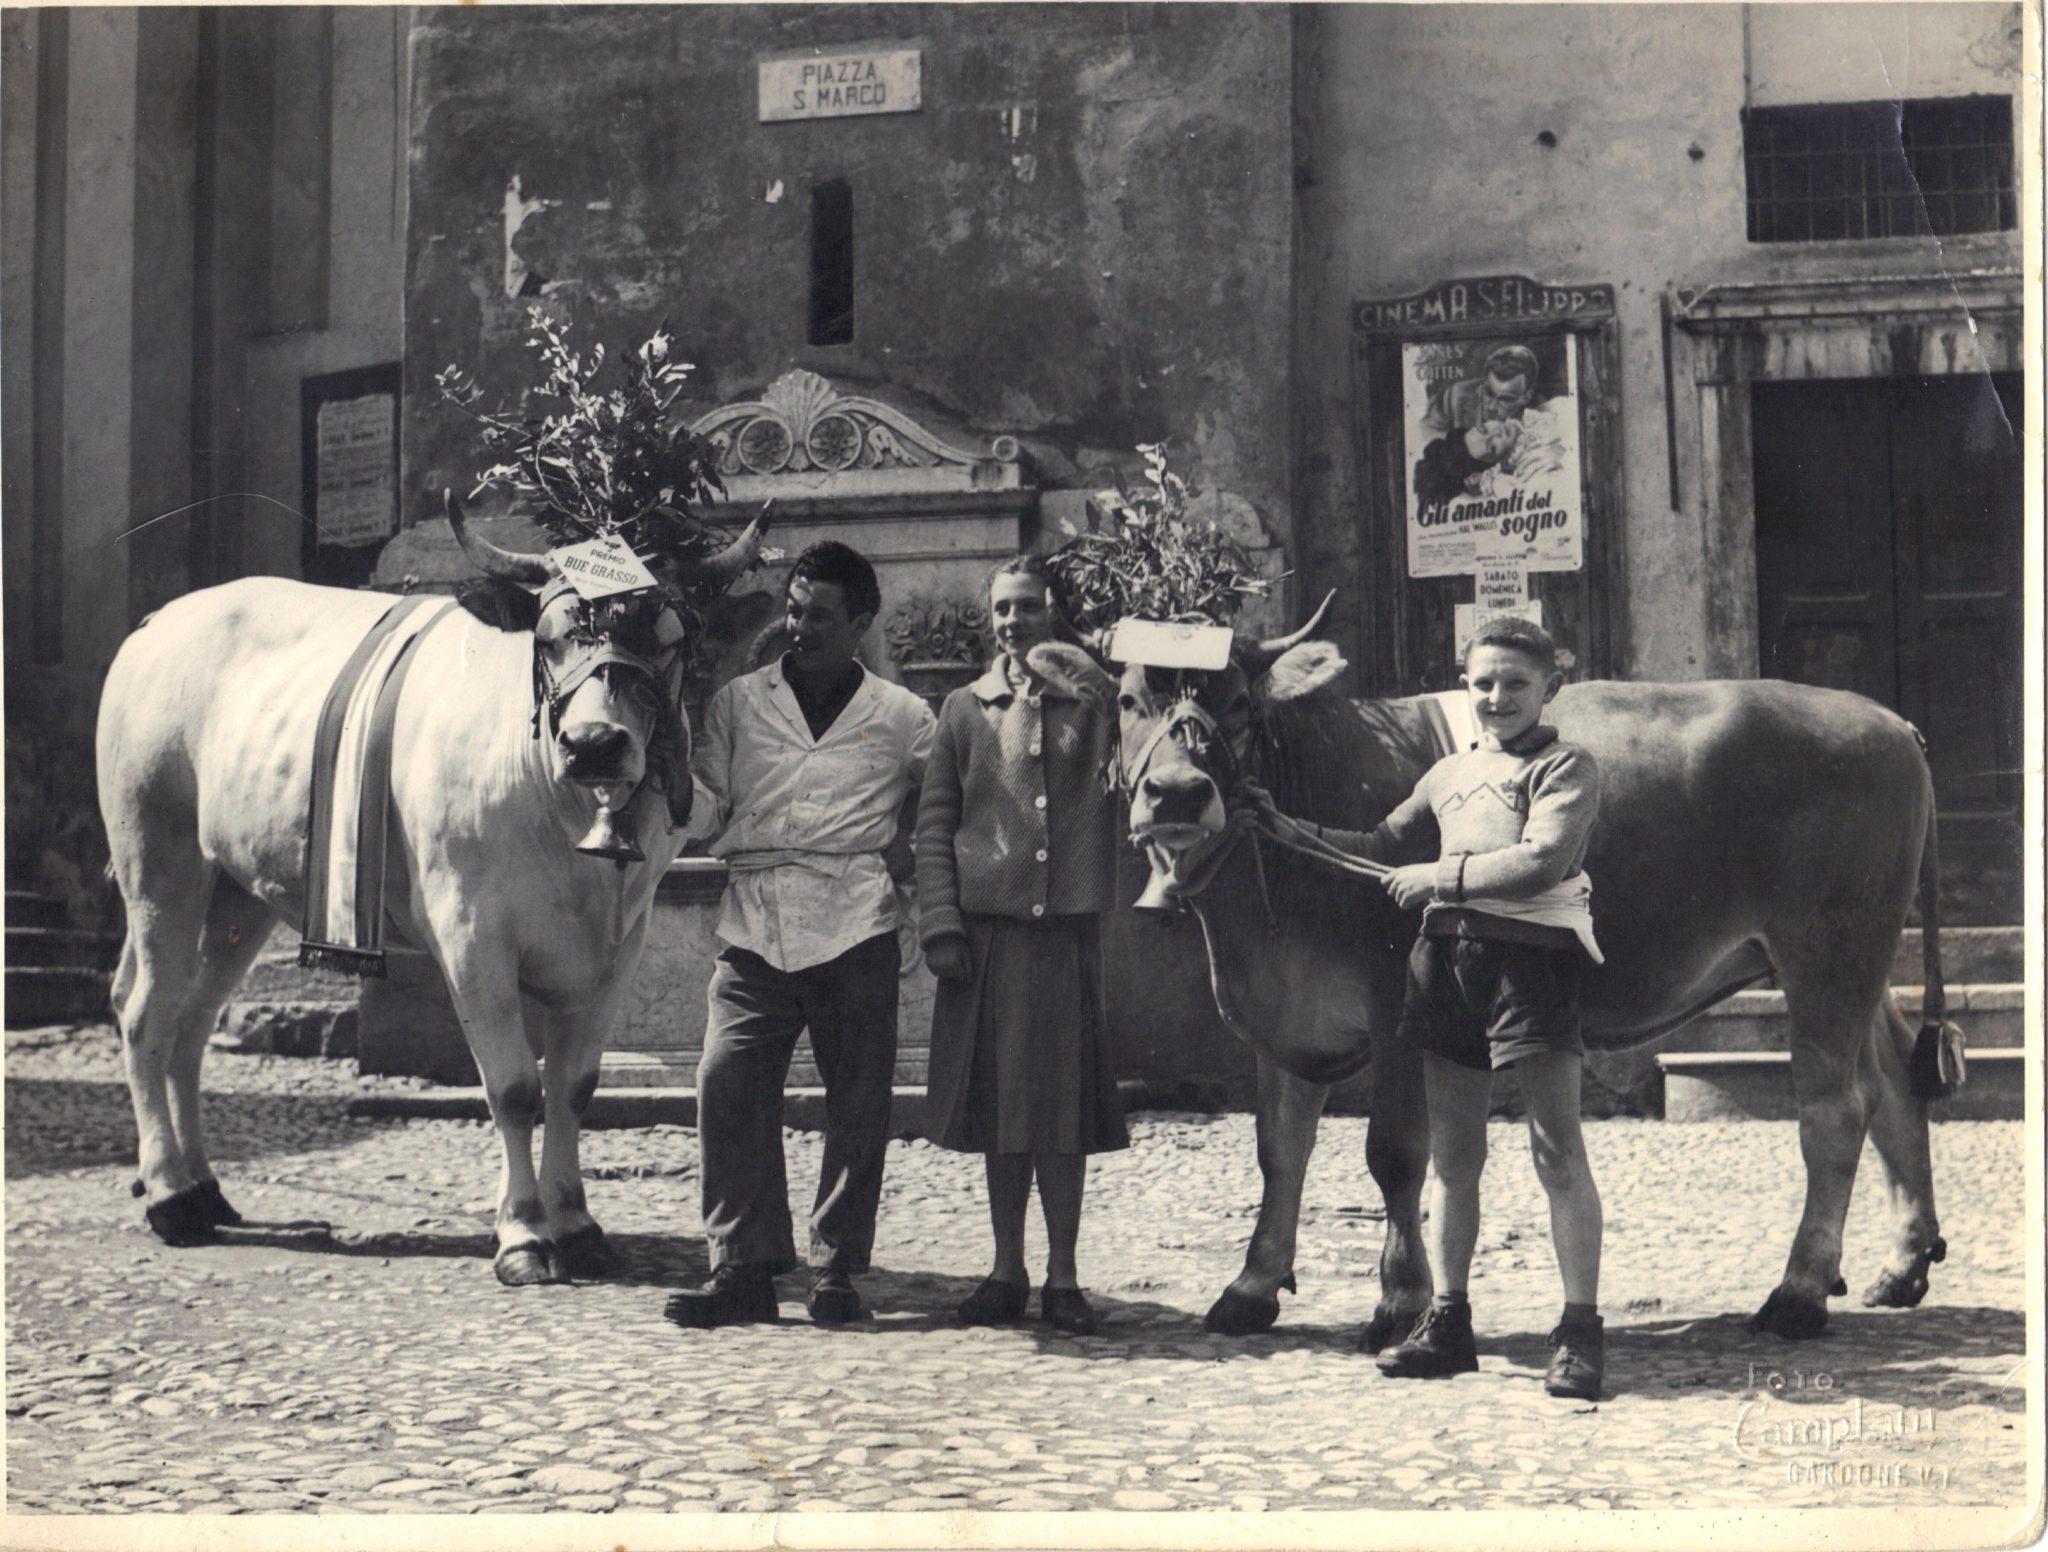 Peruchetti Vintage1